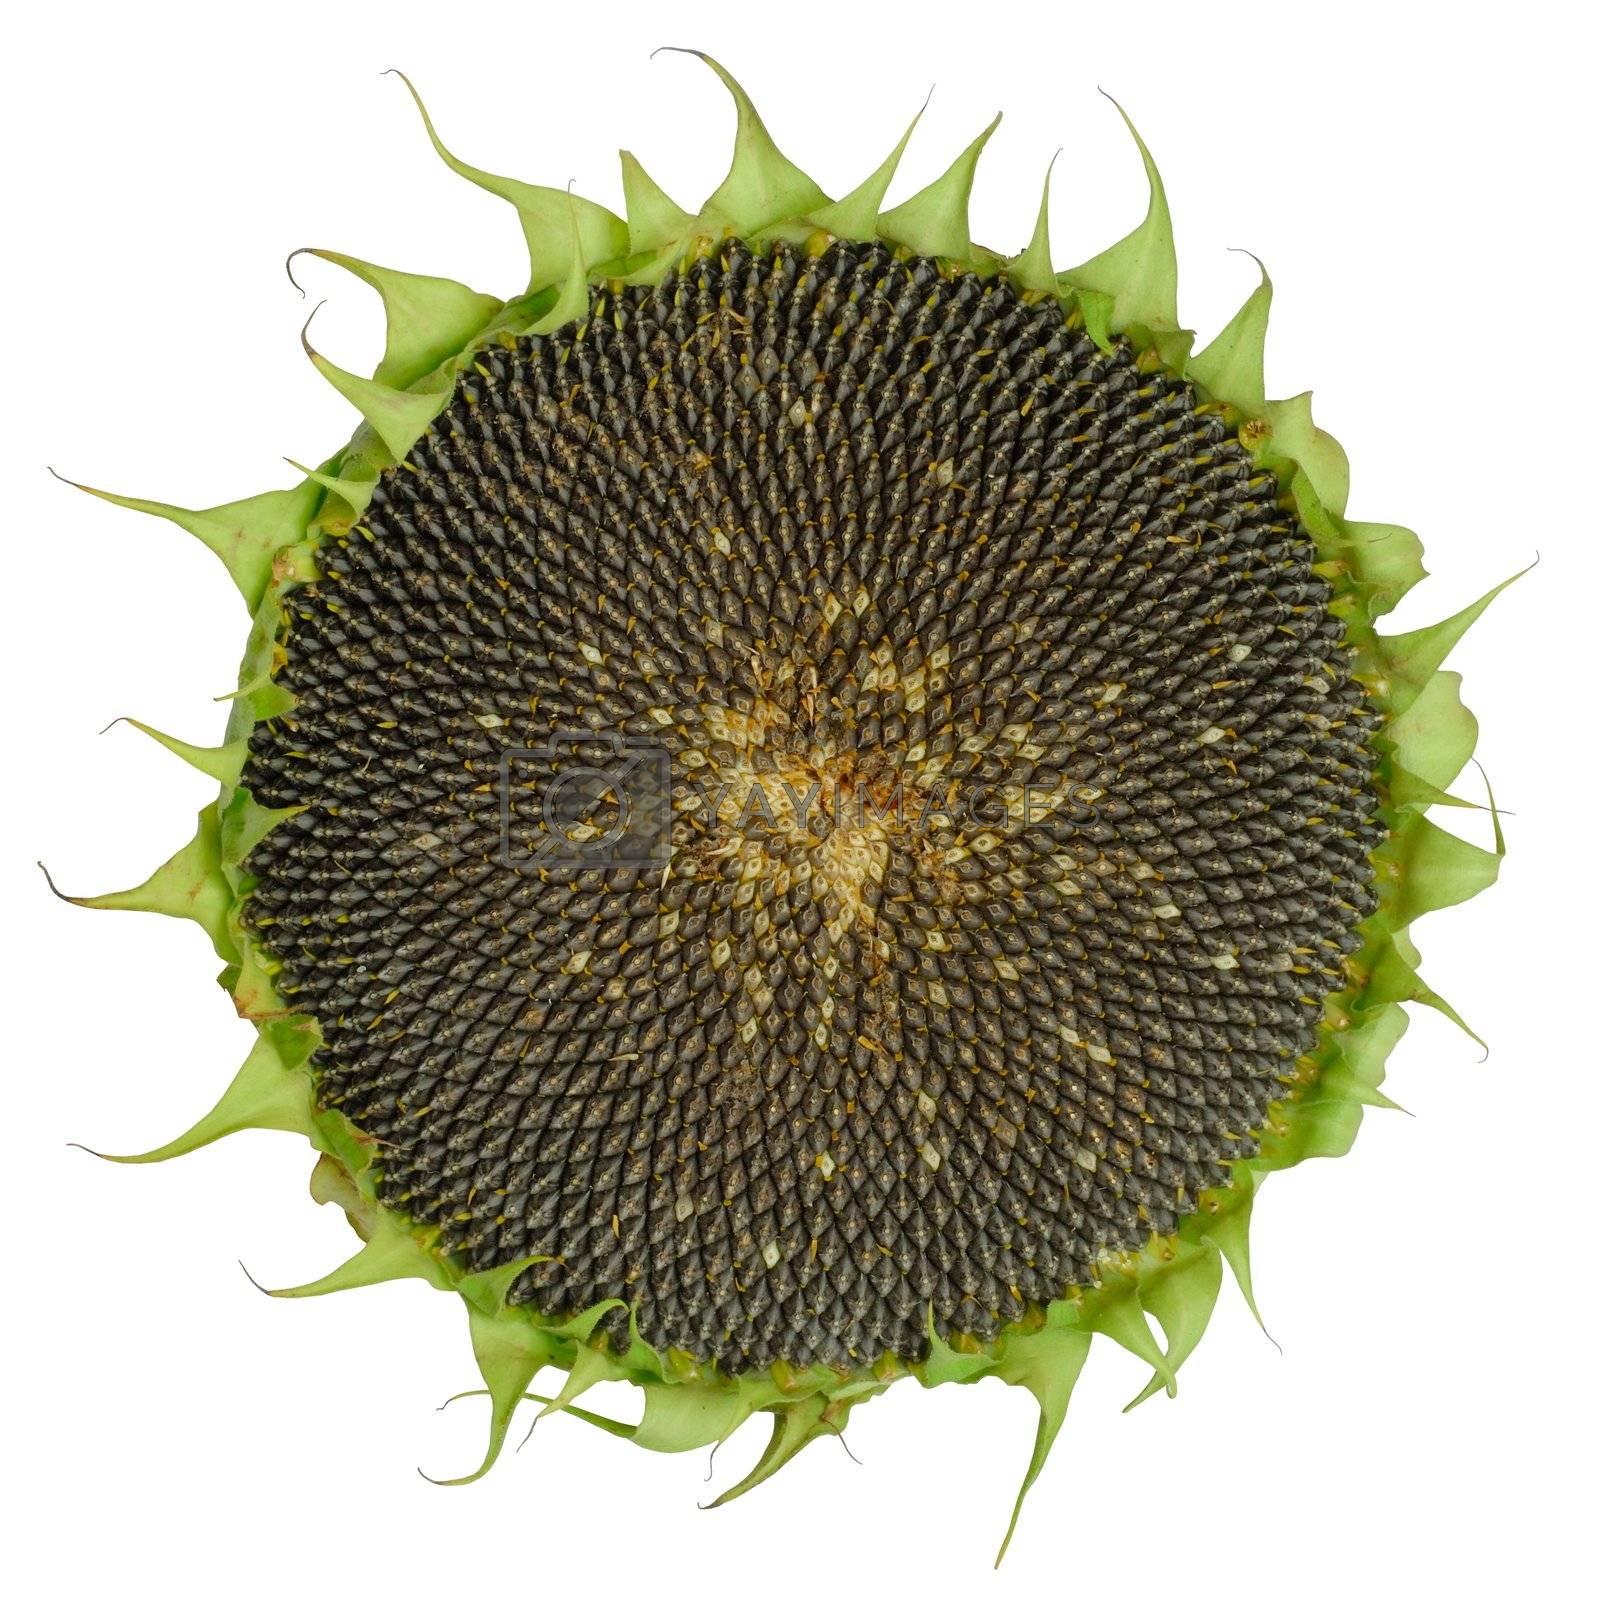 Isolated sunflower